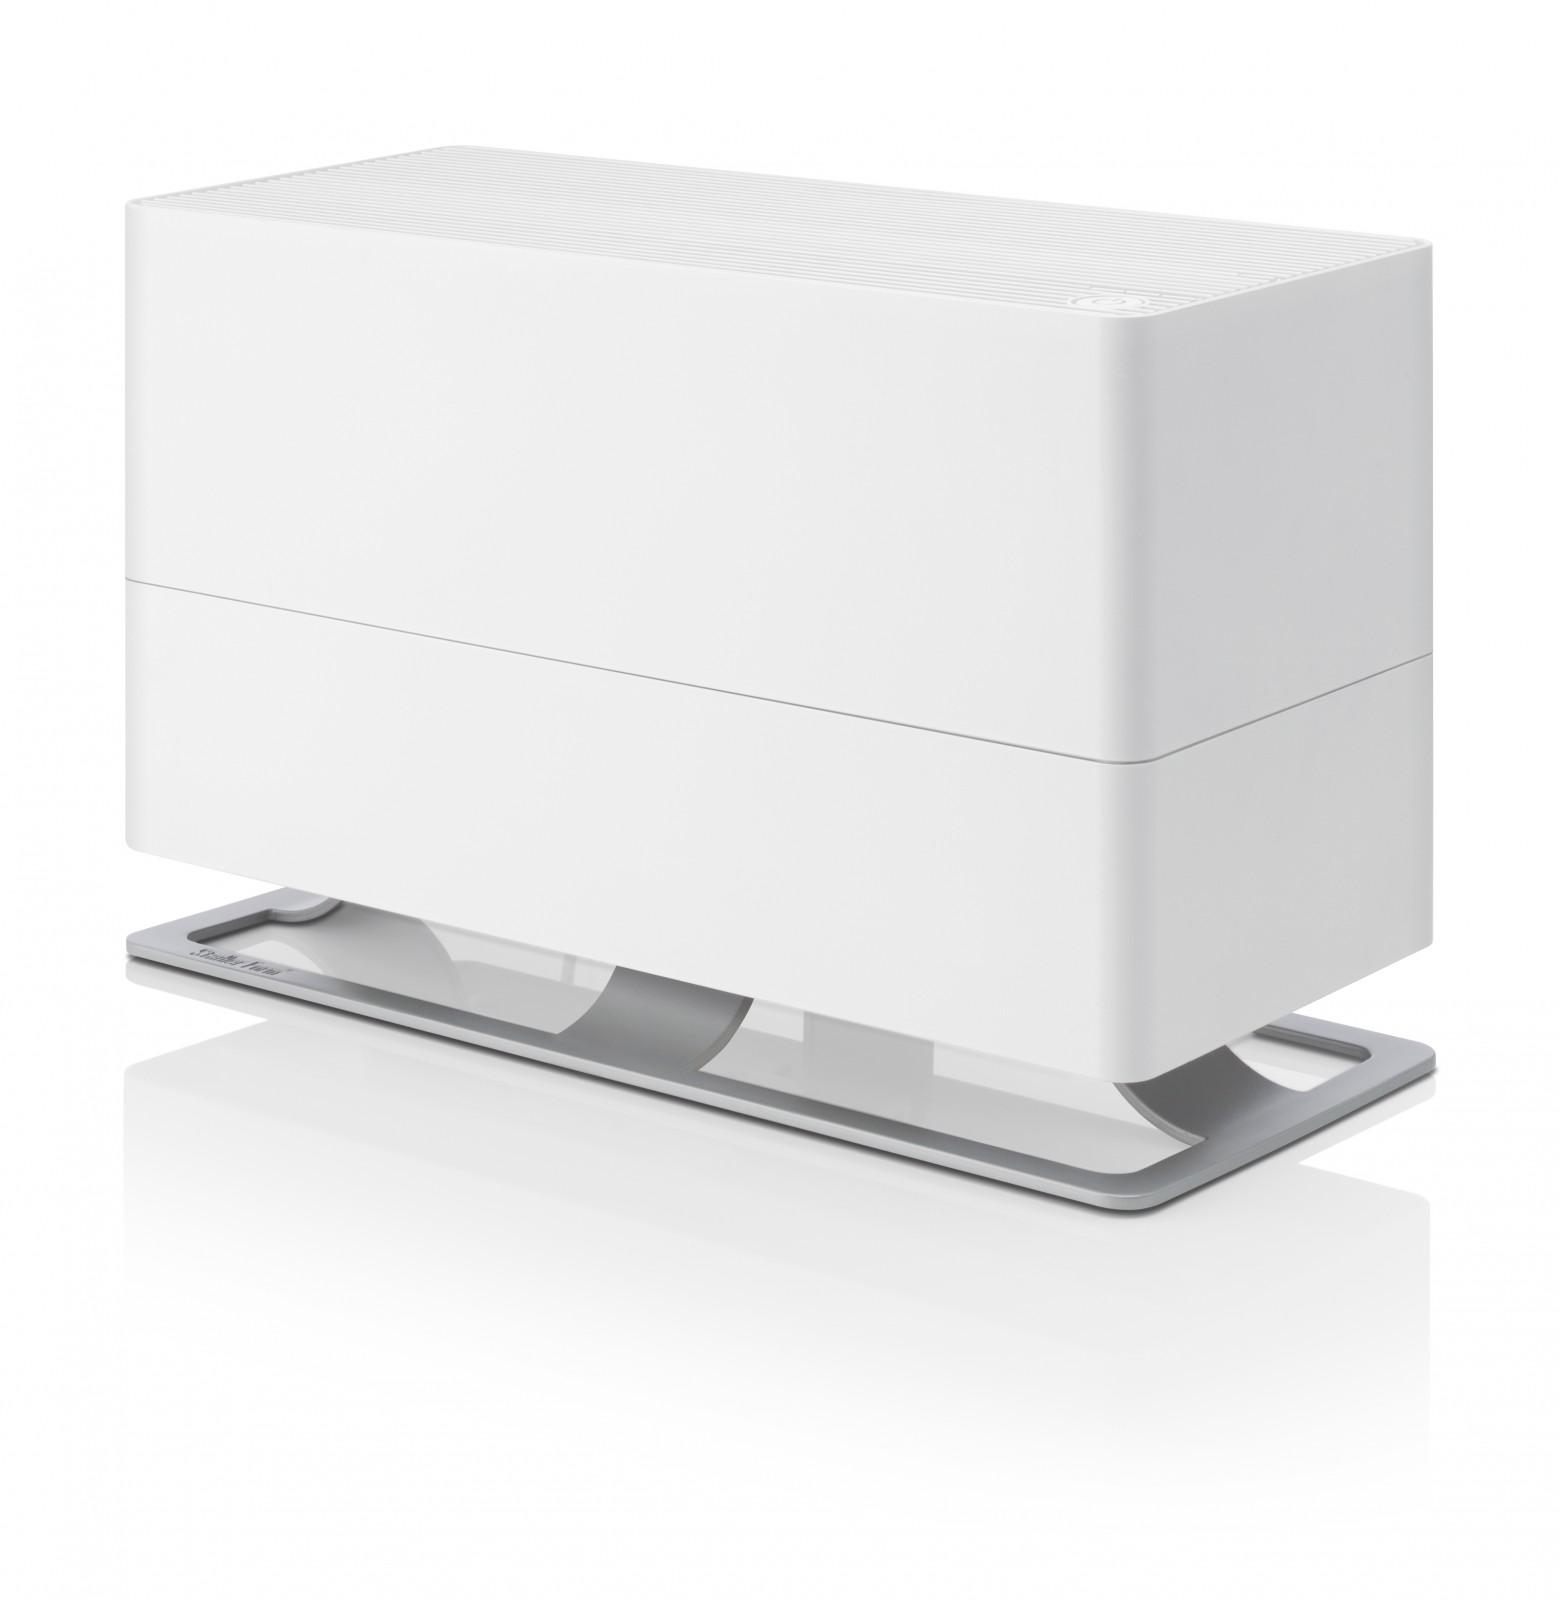 Humidifier Oskar BIG white 100 m² Room size Humidification: 1.5lbs  #646269